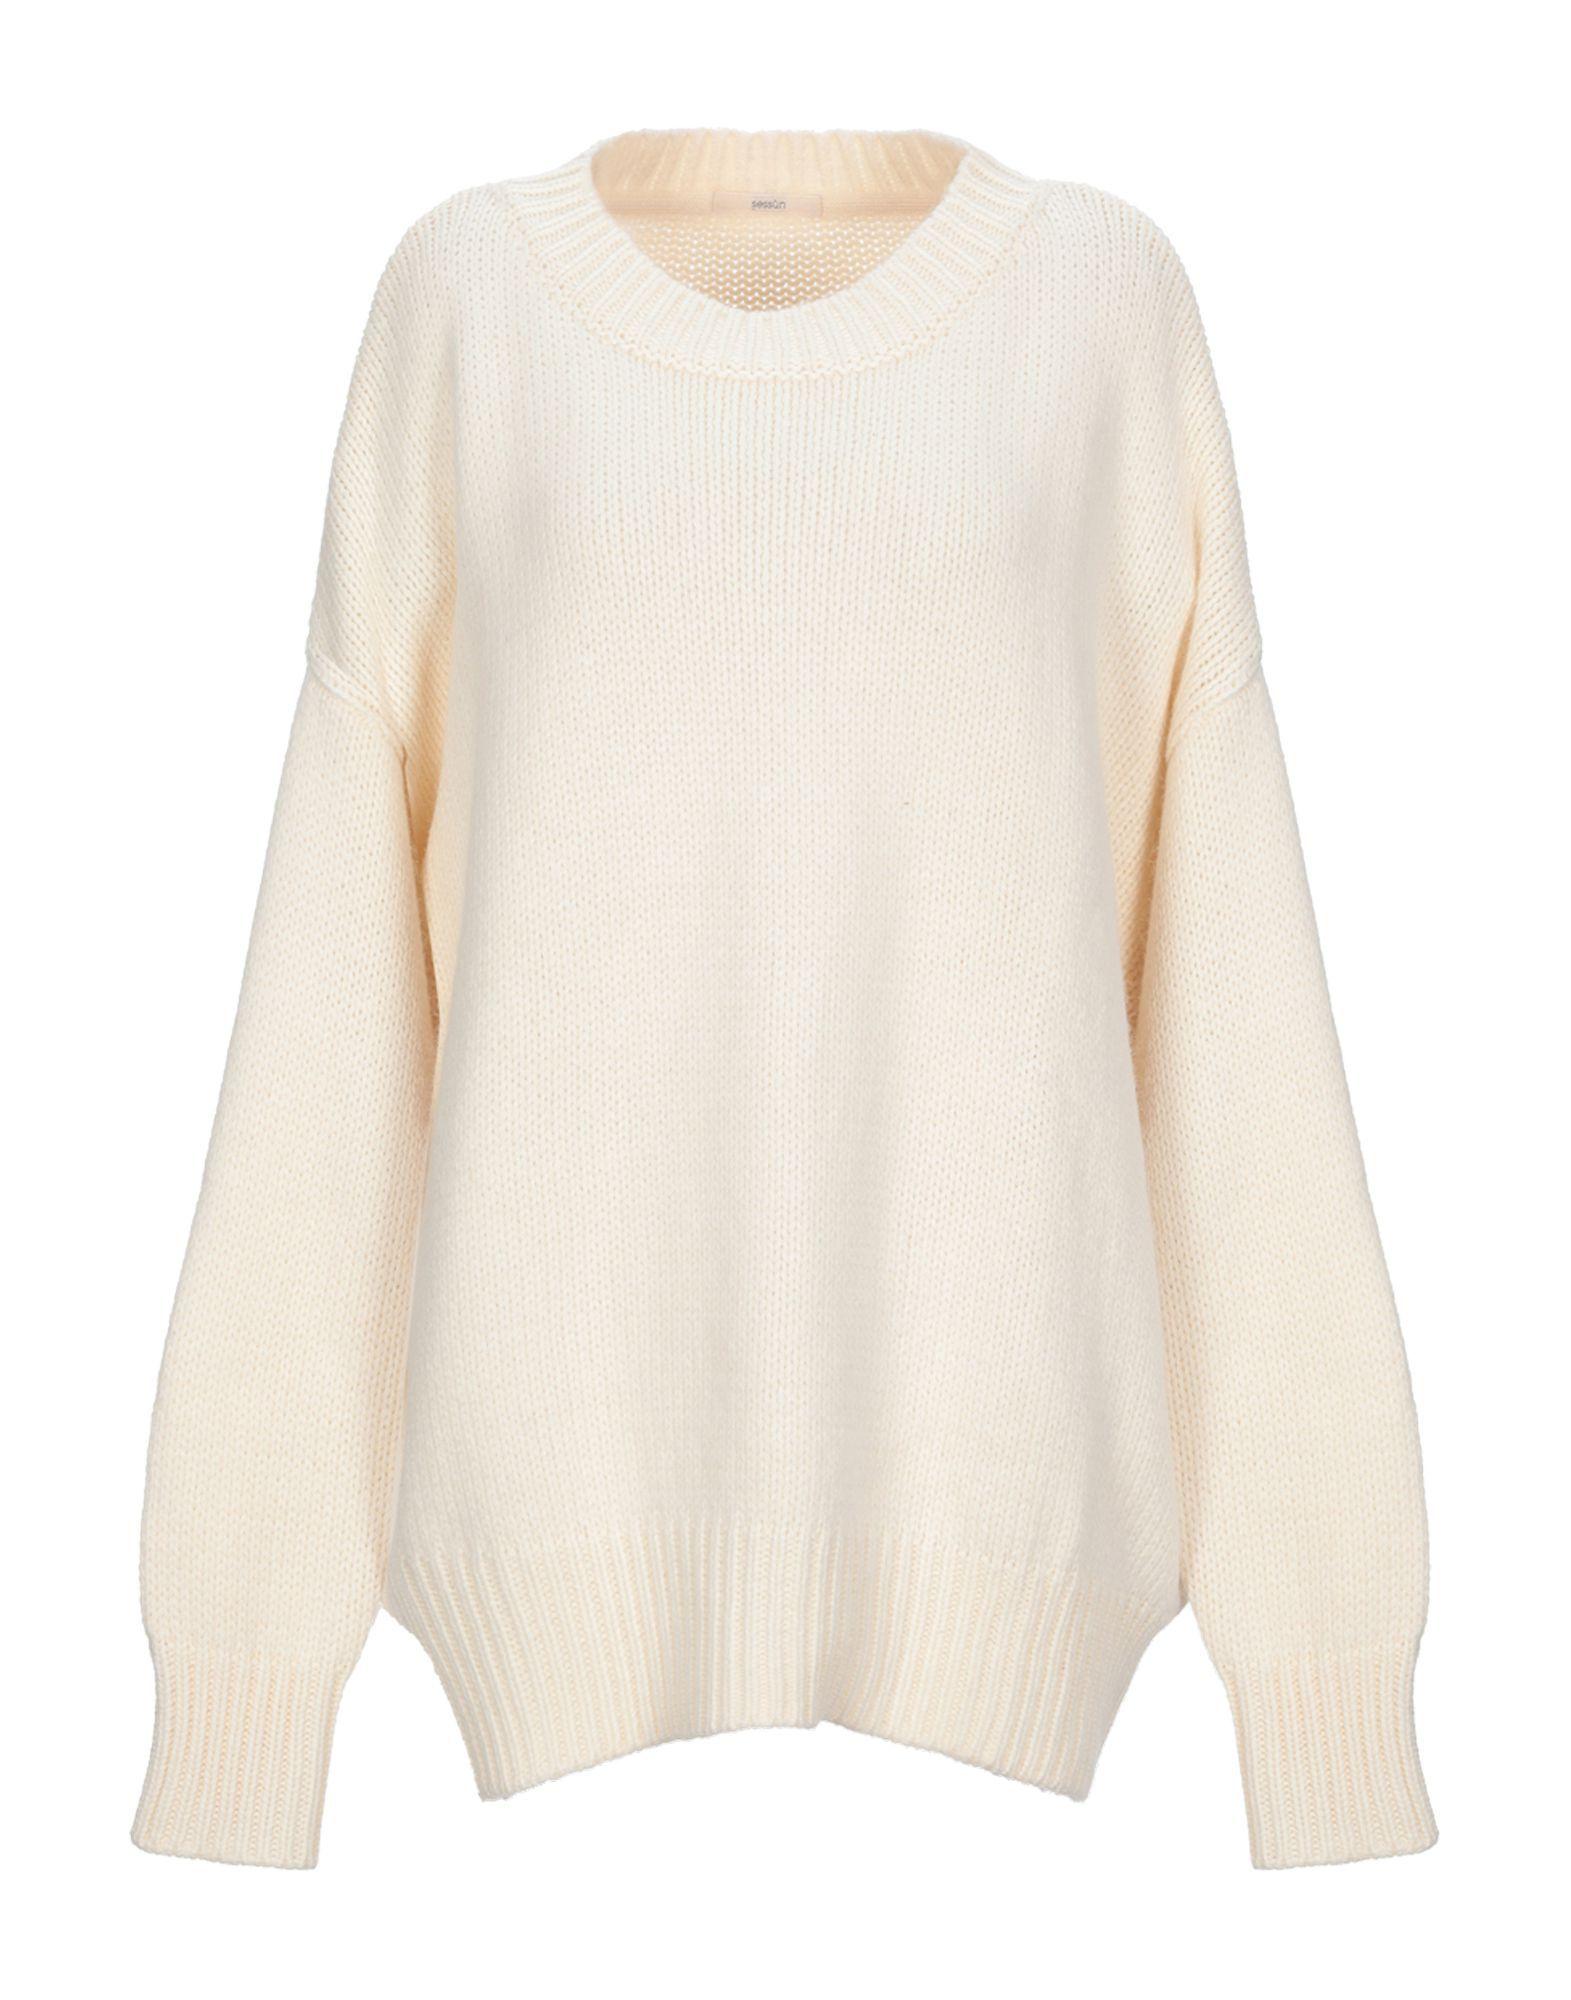 Sessun Ivory Knit Jumper